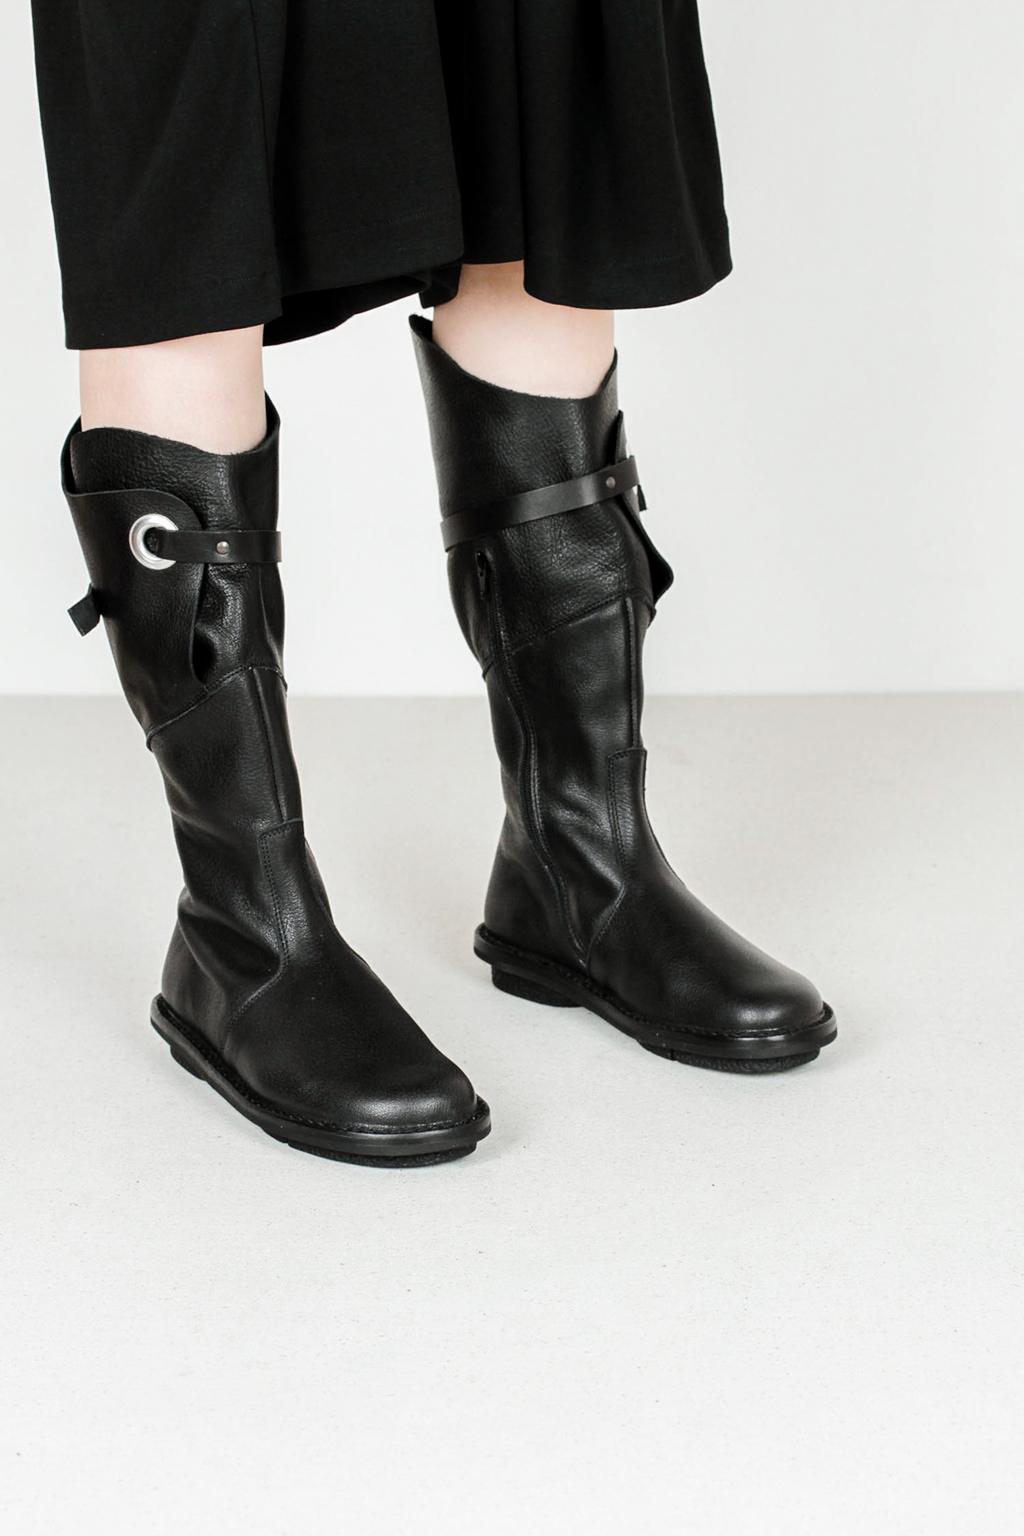 warrior f trippen trippen white unconventional footwear, handmade in